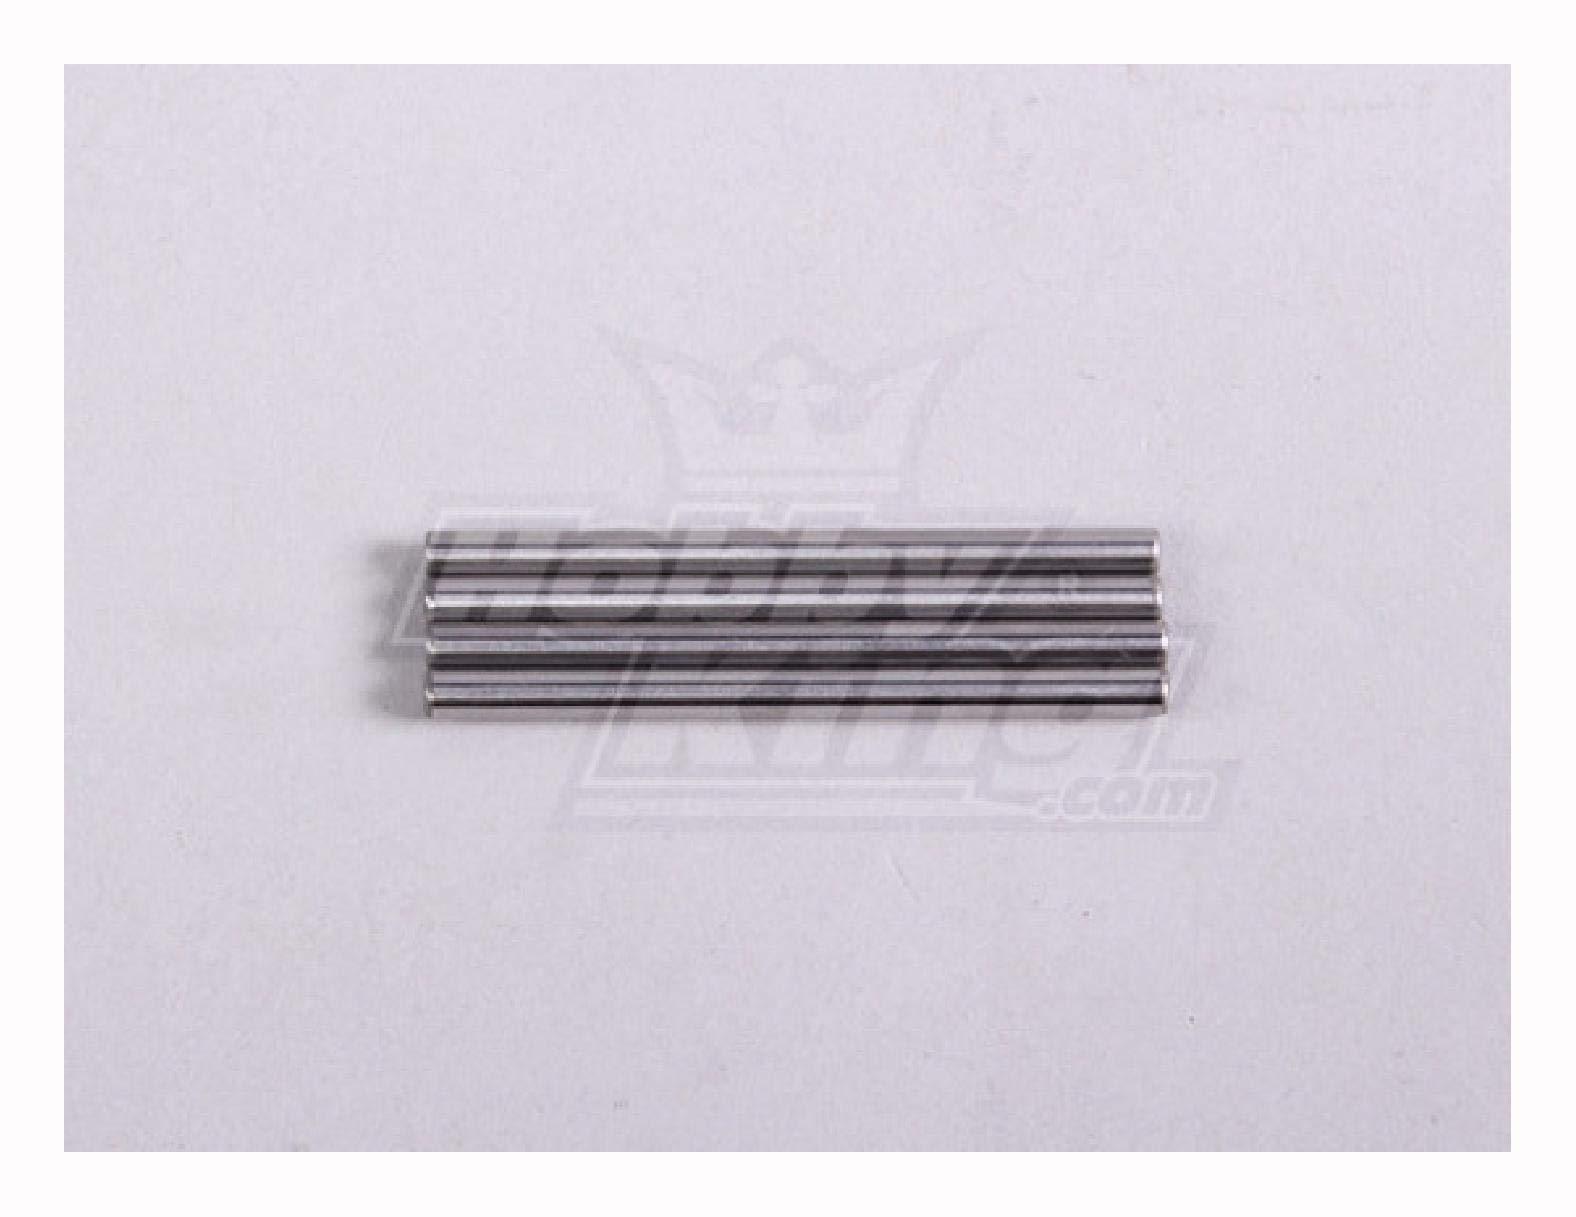 Spare Parts, Pin for Upper Susp. Arm (4pcs/Bag) - A2016T